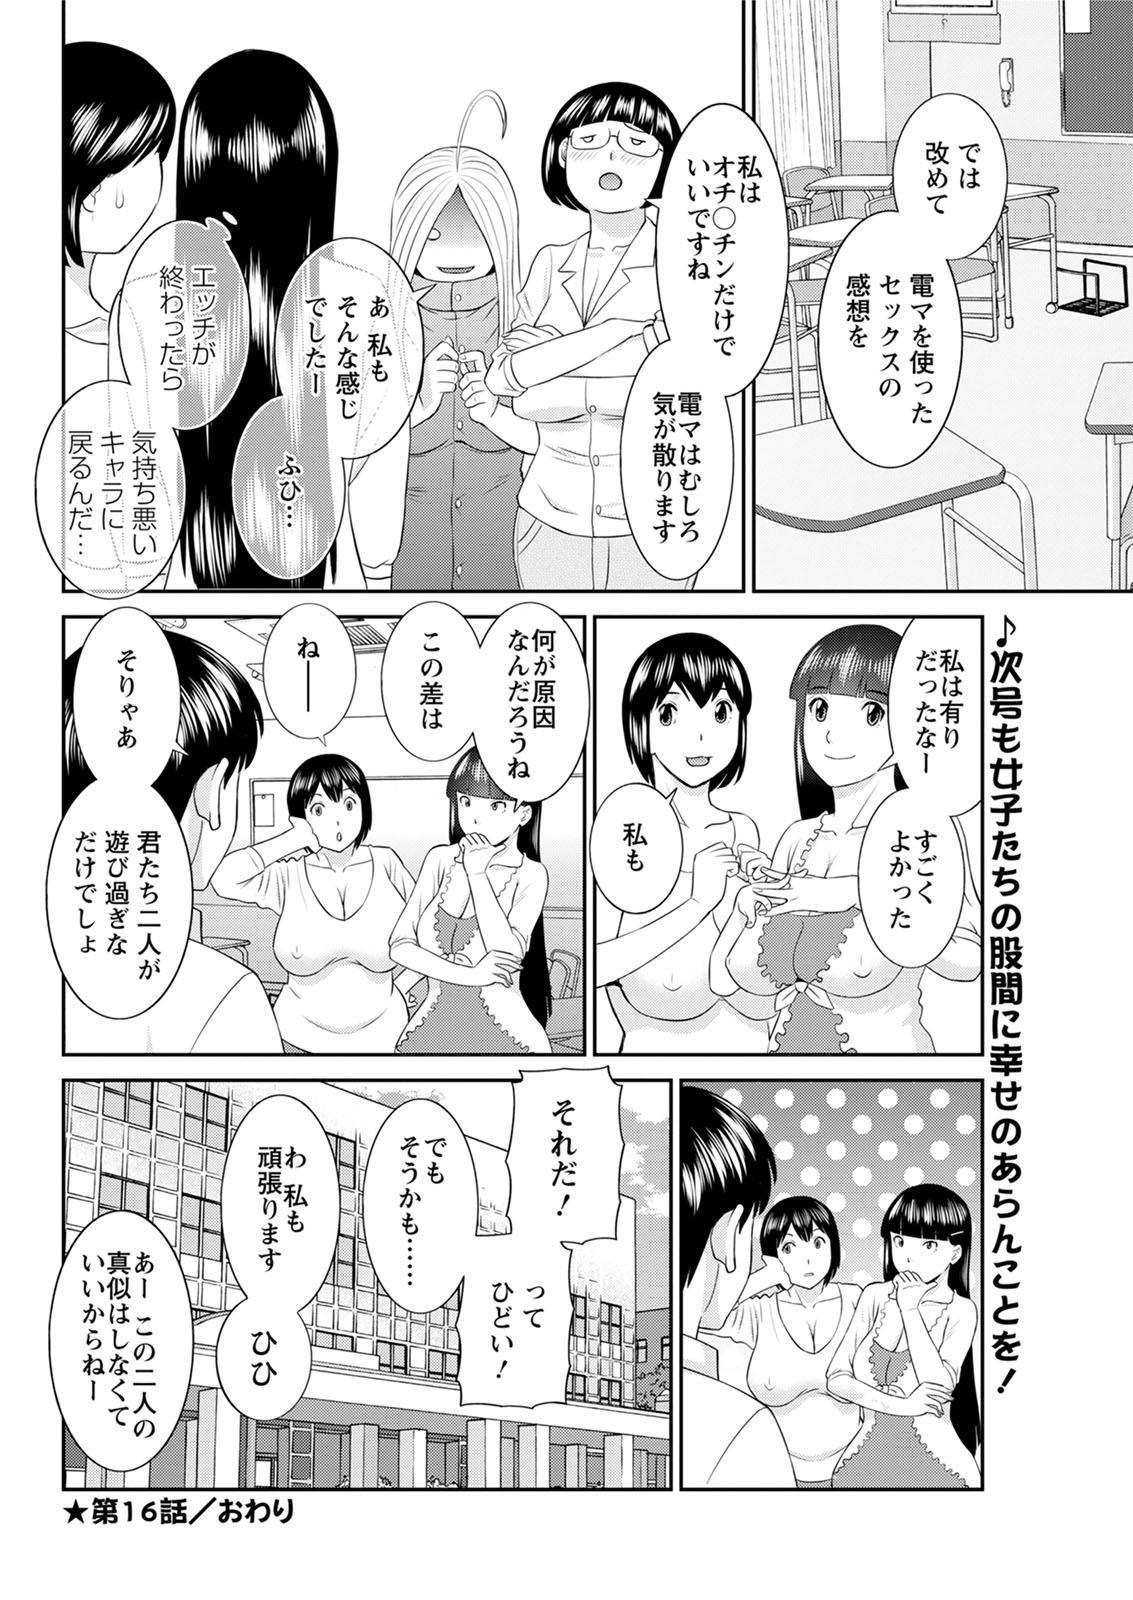 [Kawamori Misaki] Kaikan Hitotsuma Gakuen Ch. 1-6, 8-16 [Digital] 274